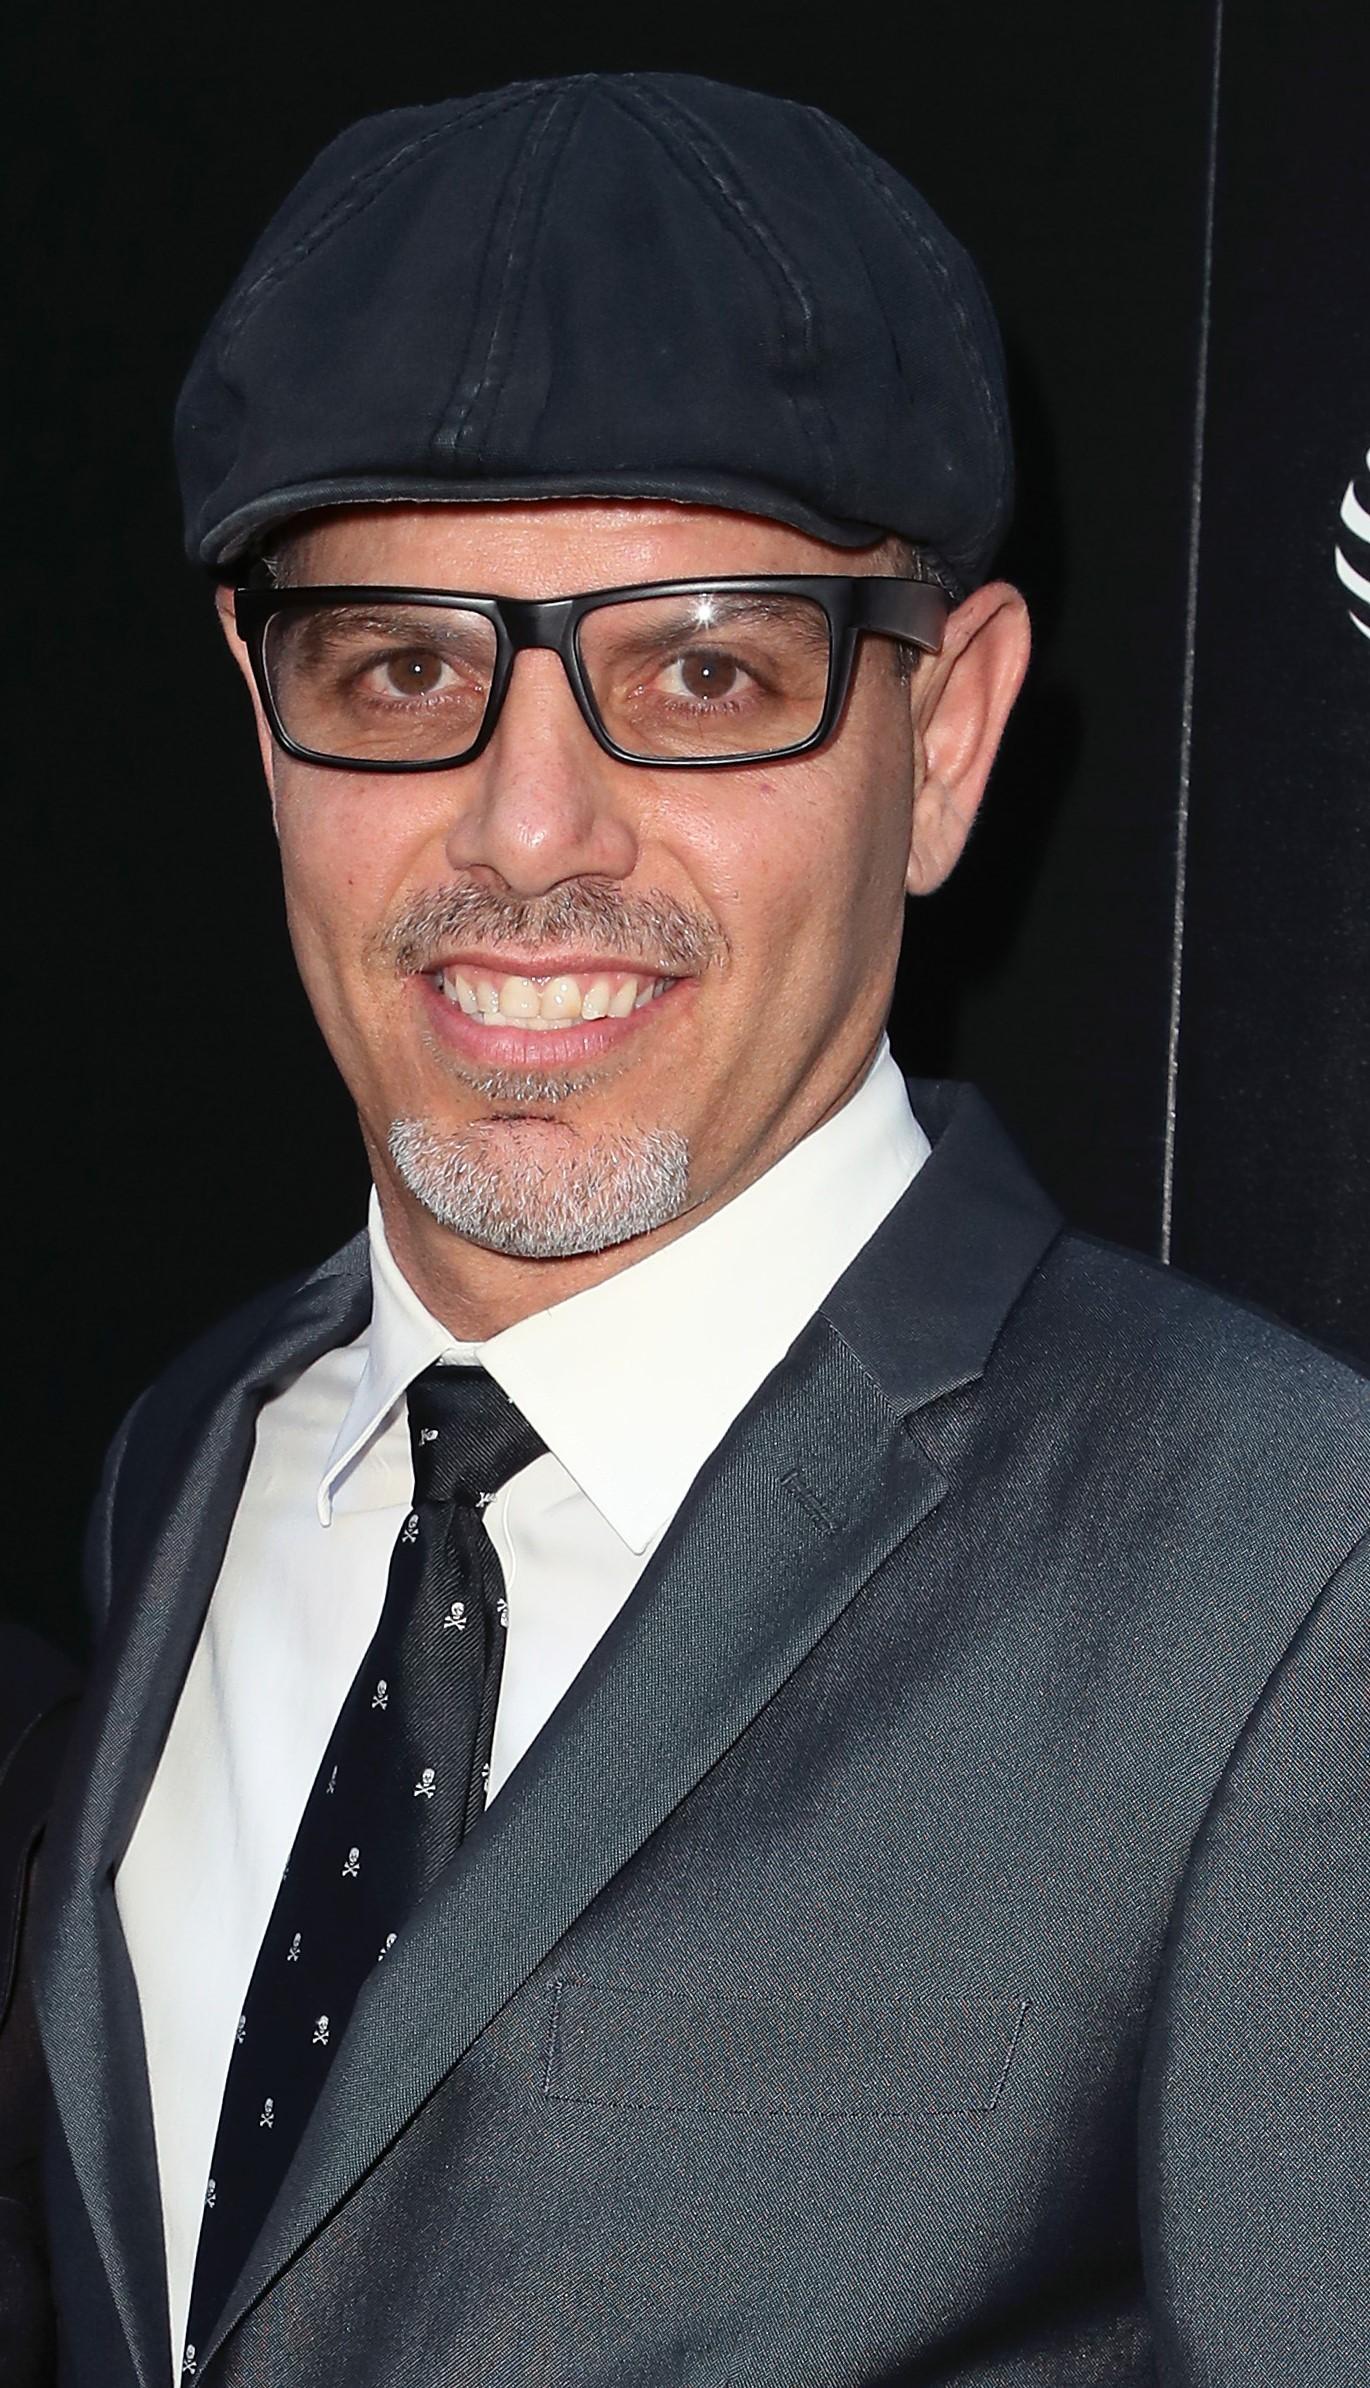 Dillon Jordan, film producer (Image: Getty Images)